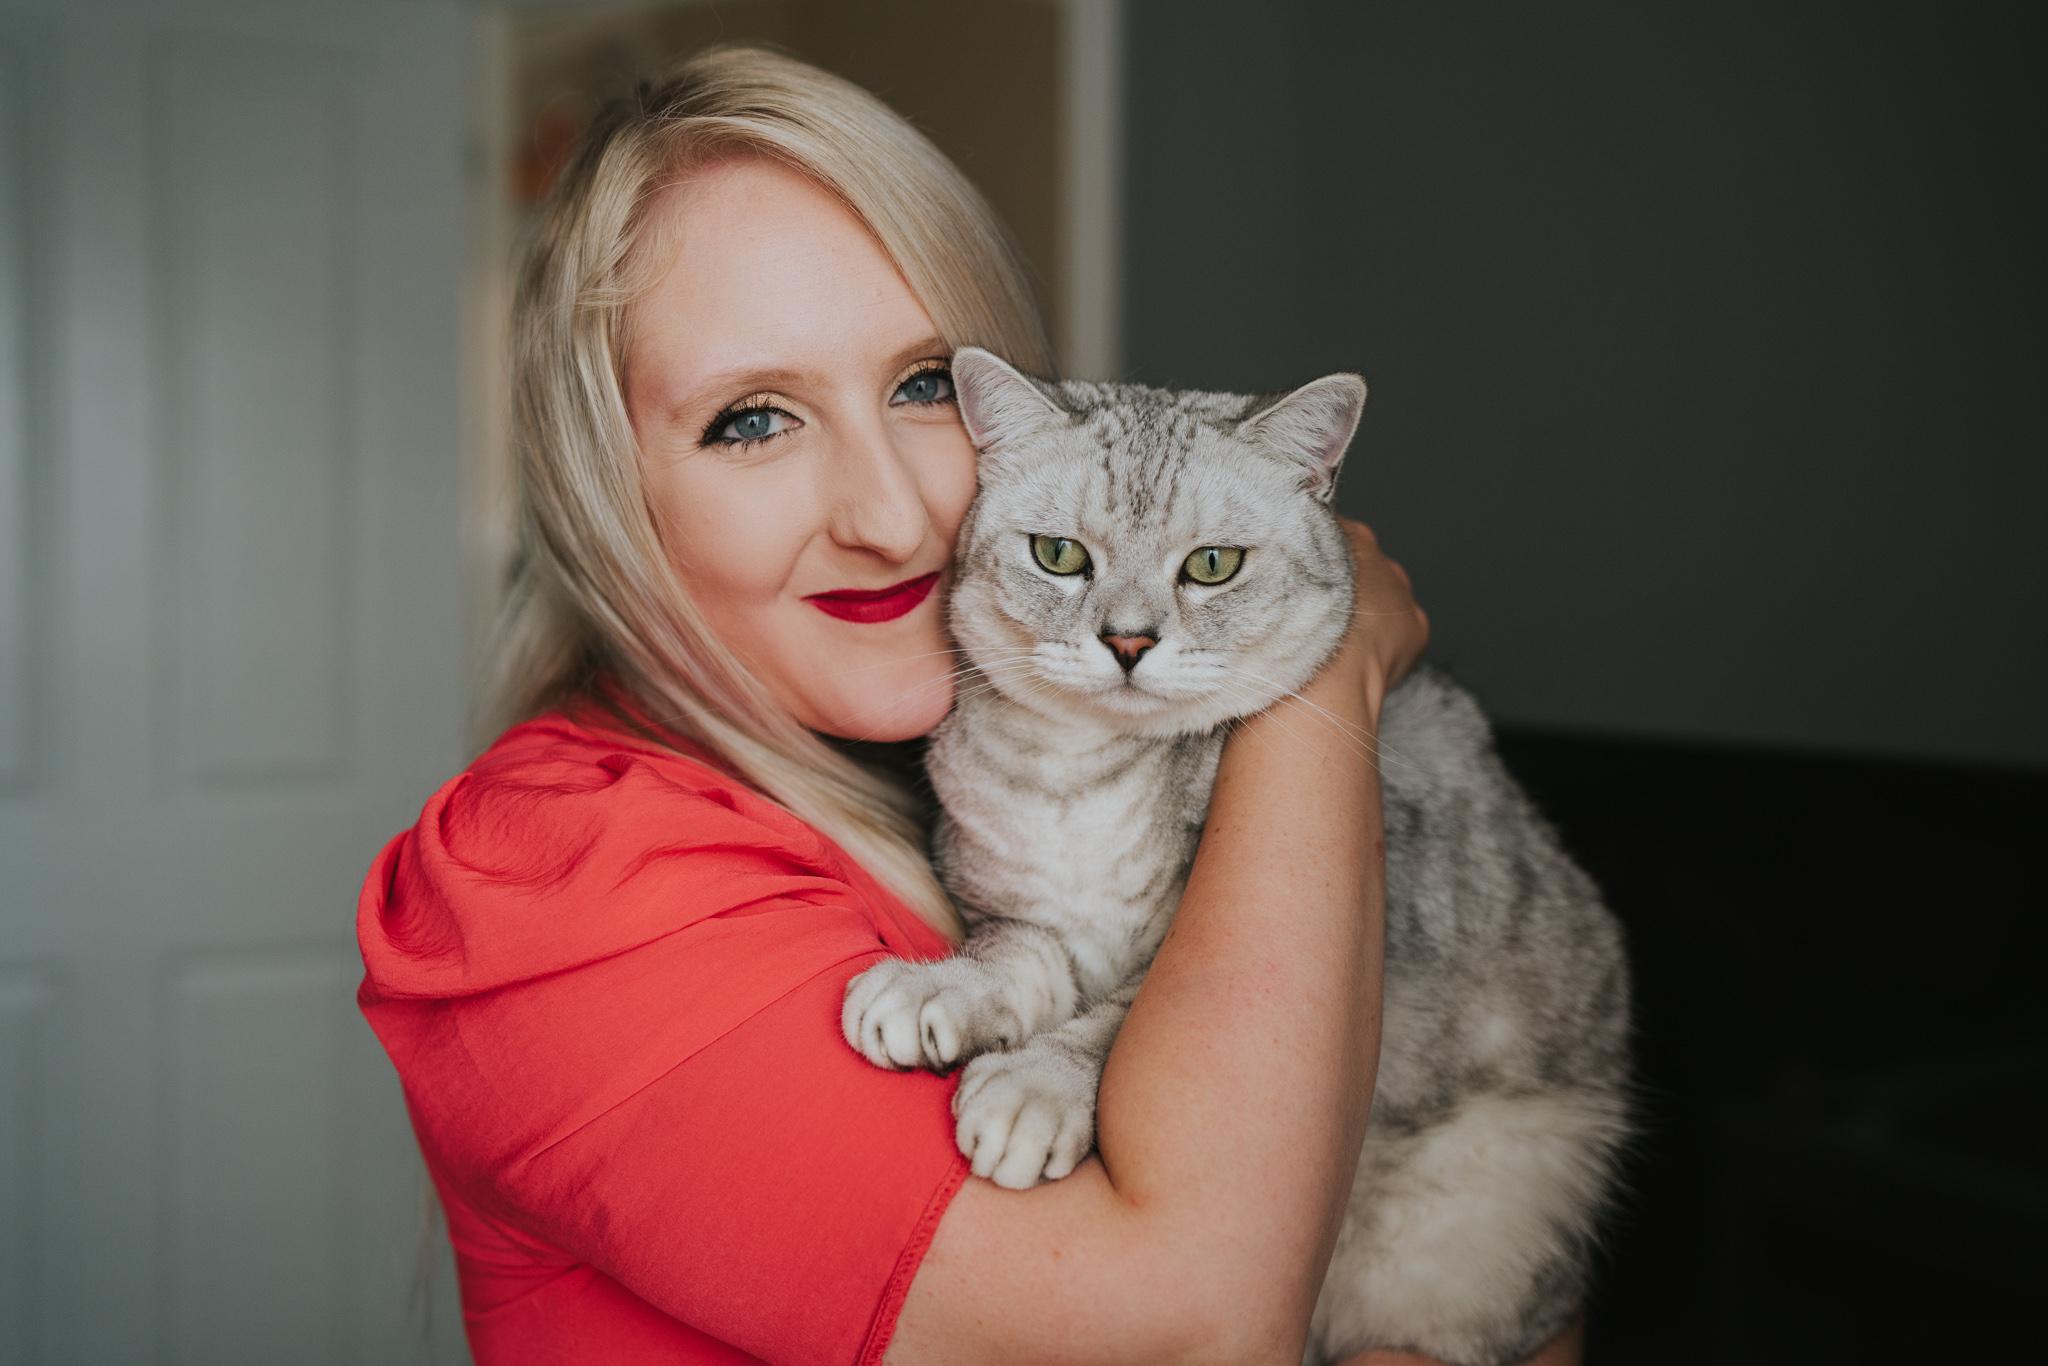 chara-neil-at-home-pre-wedding-session-cats-coalhouse-fort-grace-elizabeth-colchester-essex-alternative-wedding-lifestyle-photographer-essex-suffolk-norfolk-devon (18 of 47).jpg